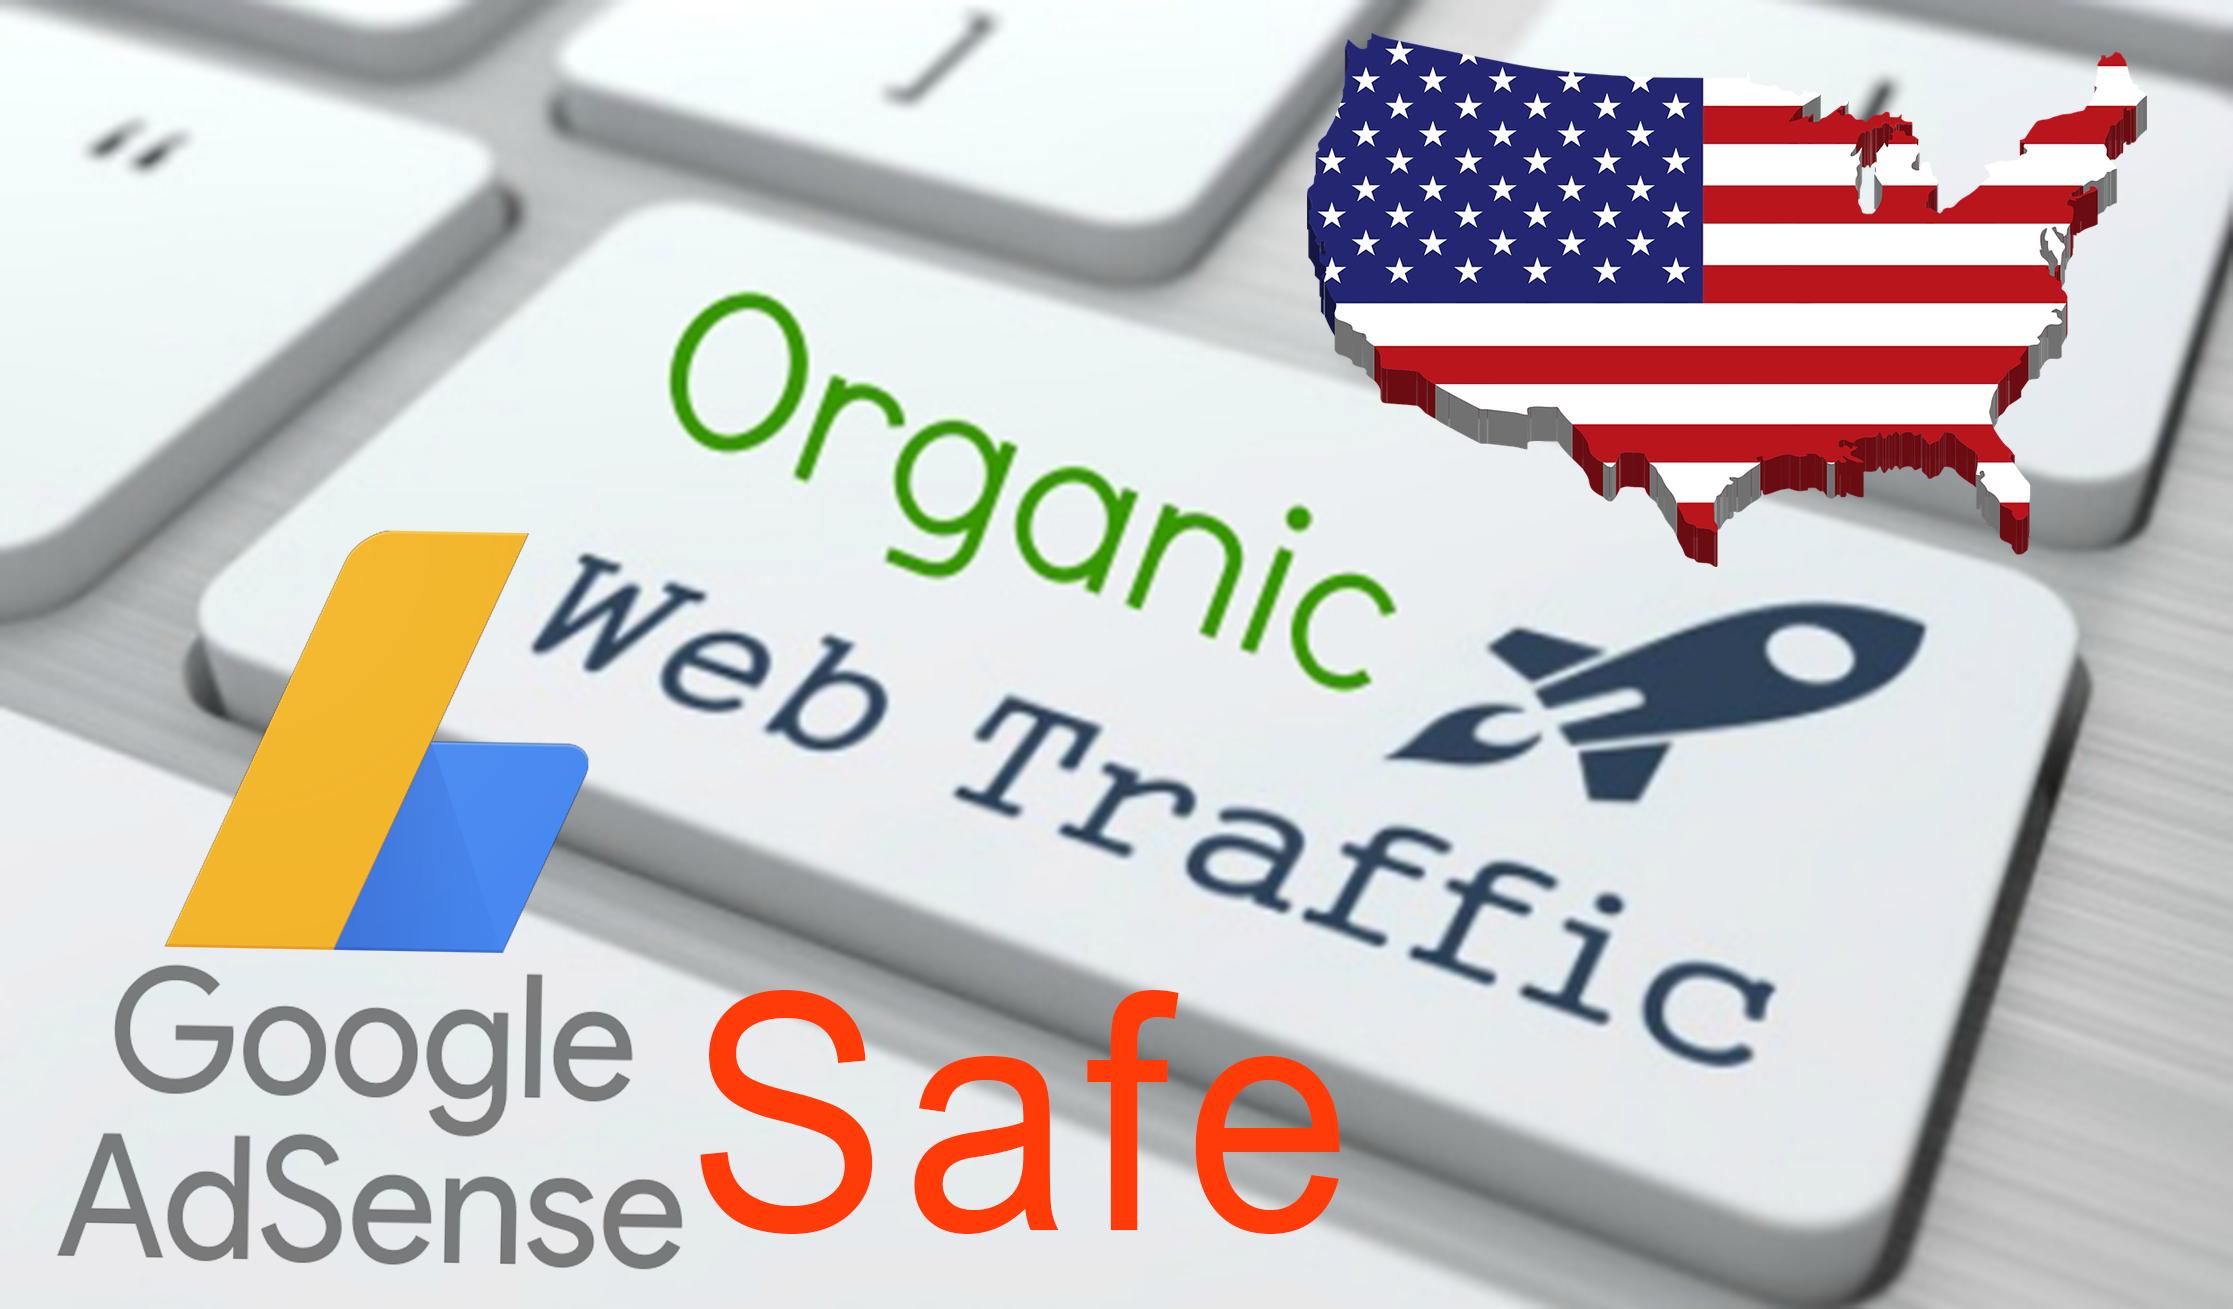 280-000-keyword-targeted-organic-traffic-within-30-days